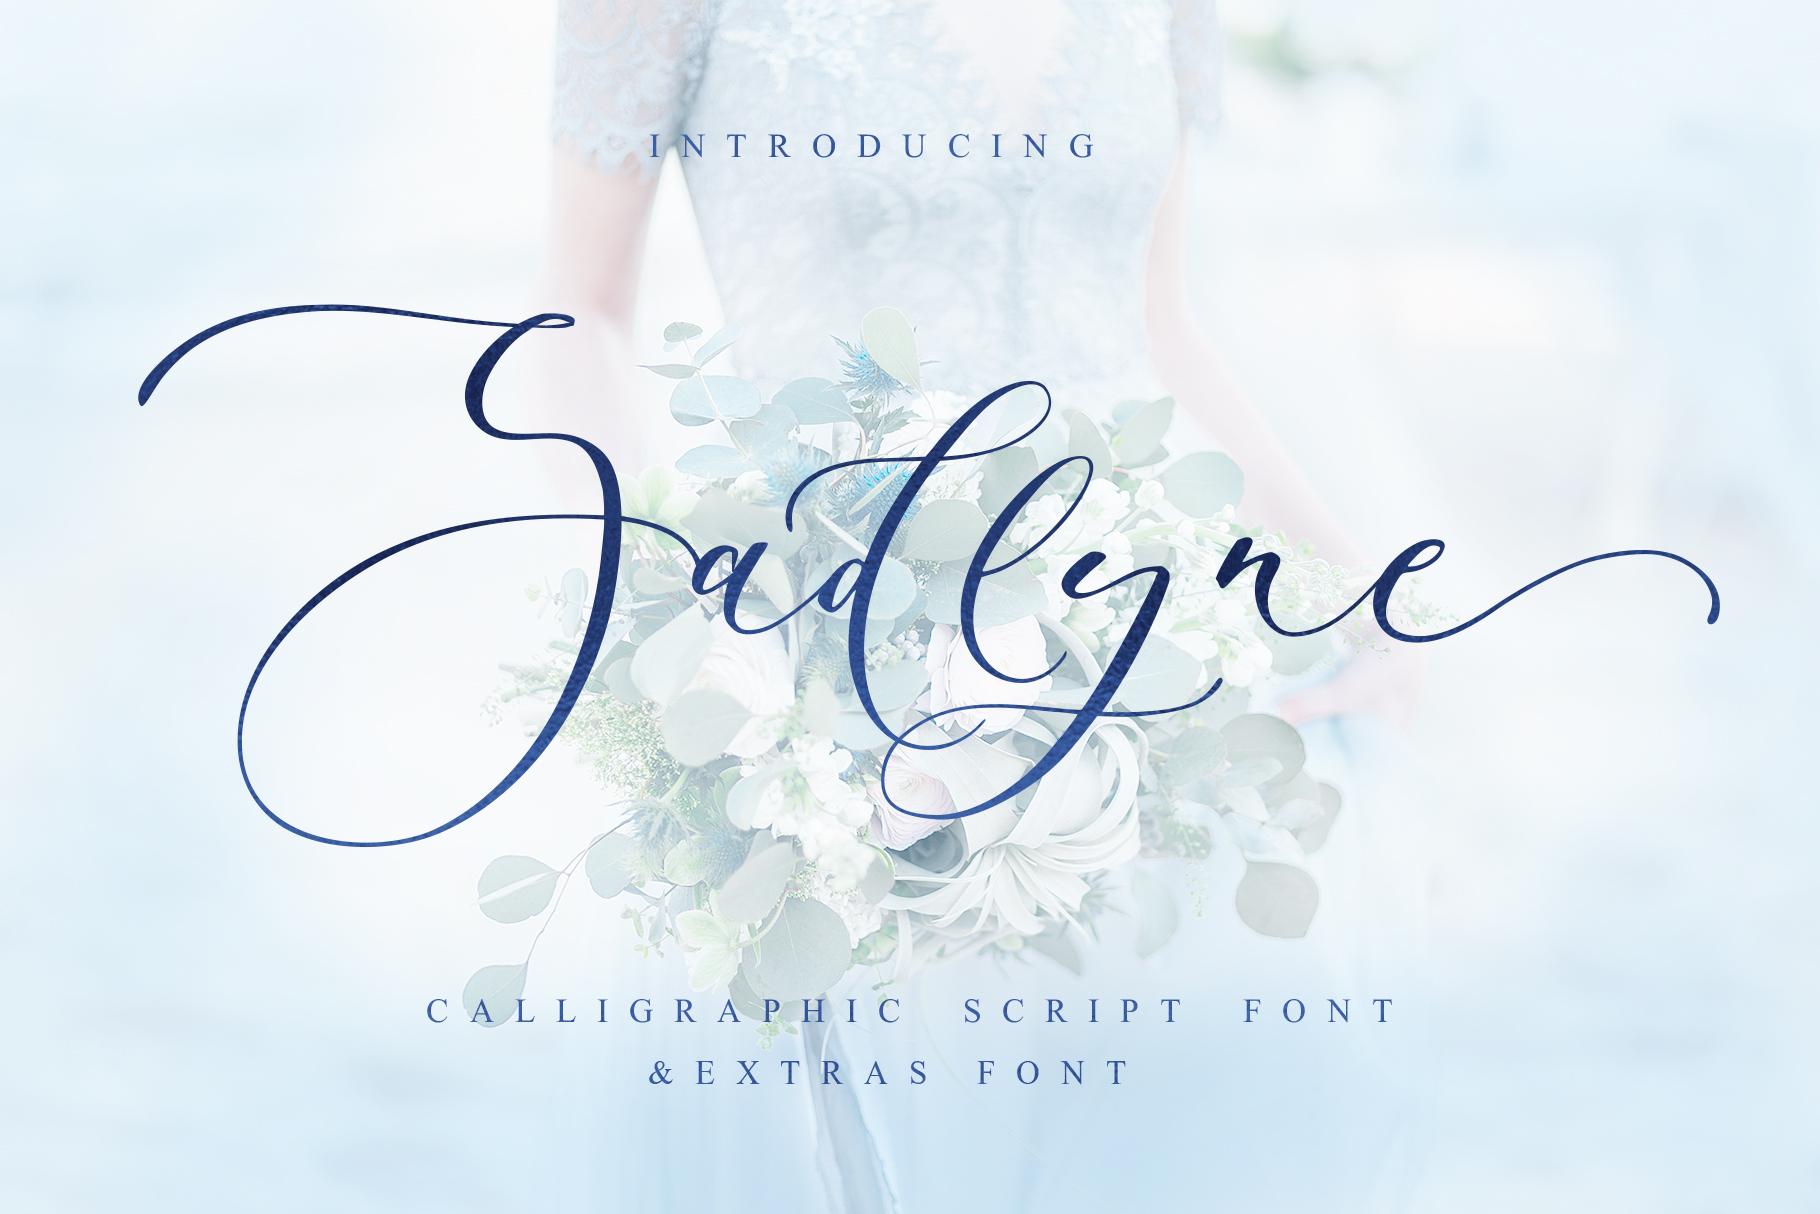 Sadlyne calligraphic font & extras example image 1